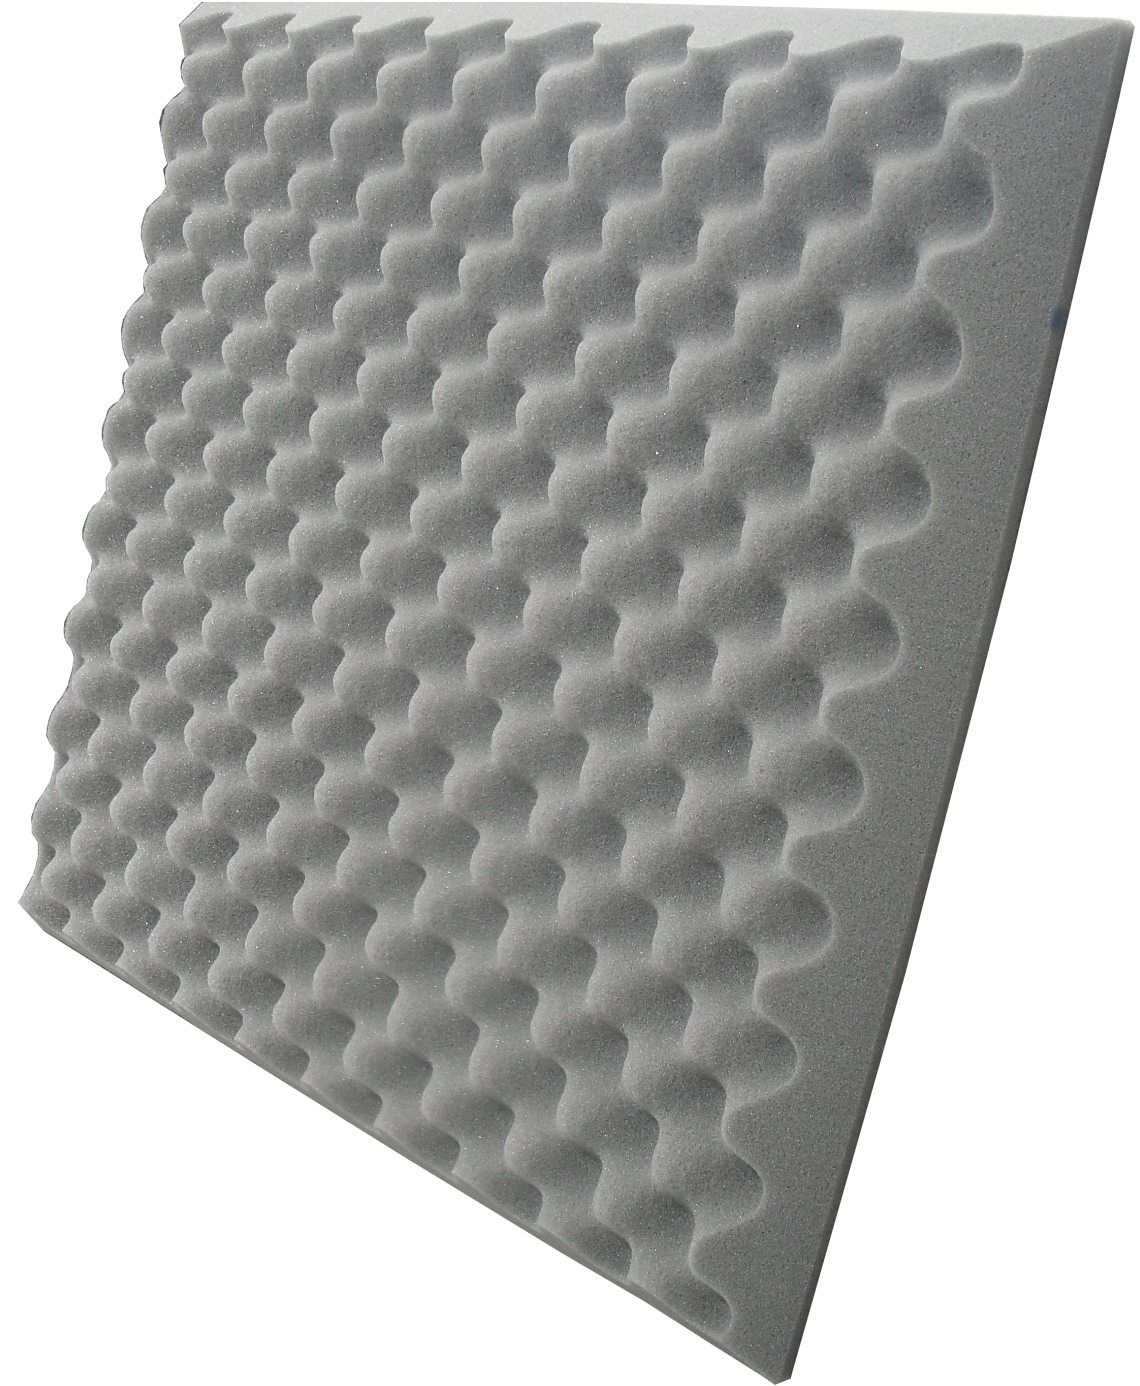 Espuma Acústica perfilada - Kit 8 - 50mm - Kit 8 peças (2m²)  - Loja SPL Acústica